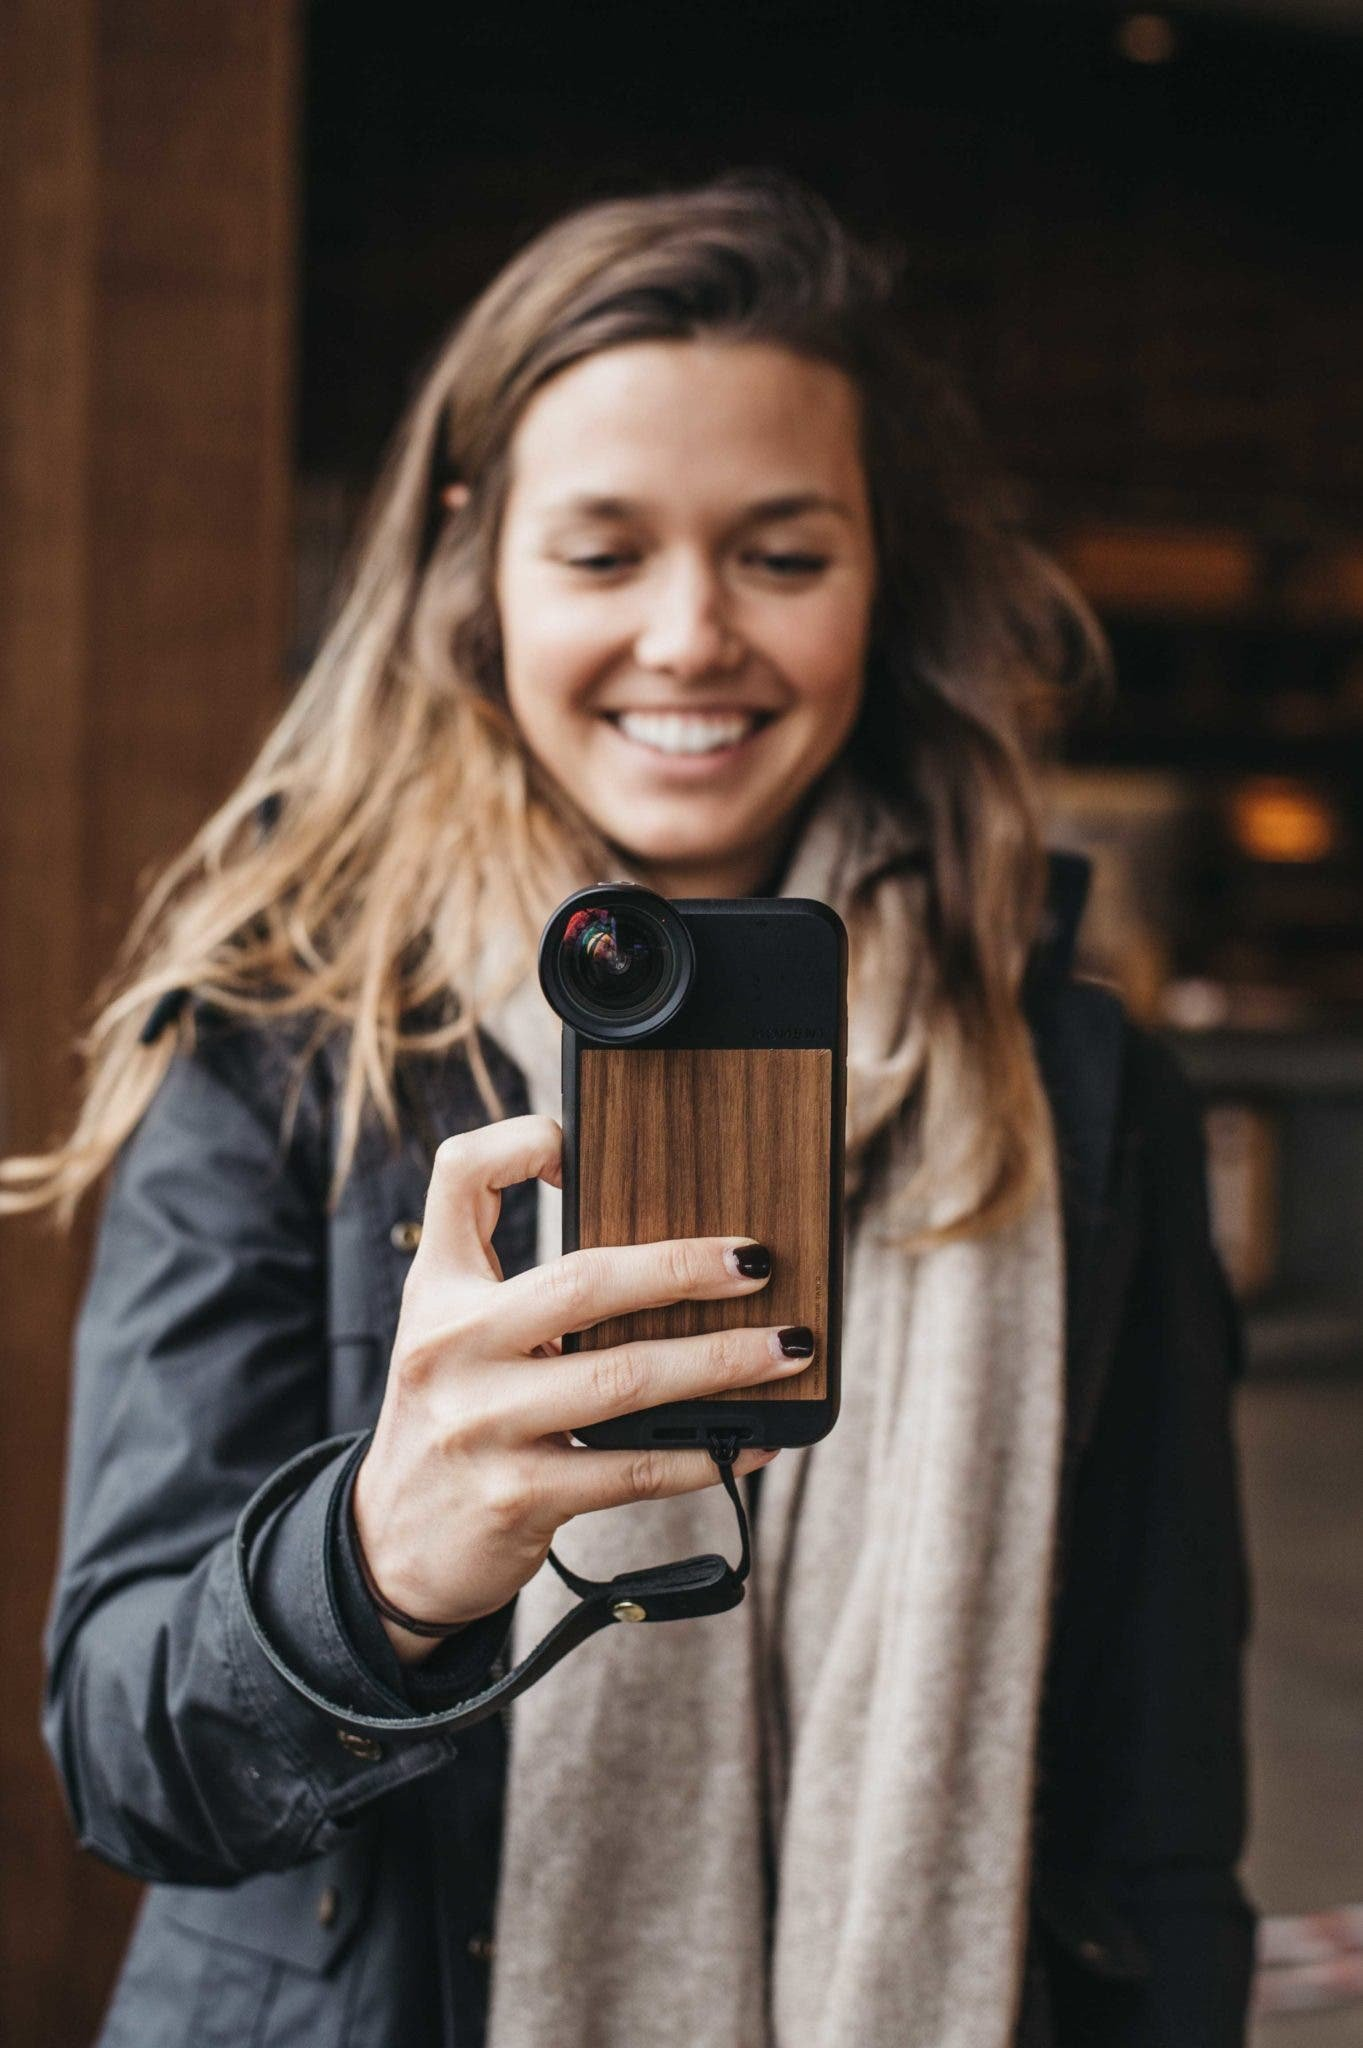 How the Smartphone Won the Consumer Camera War Using Social Media